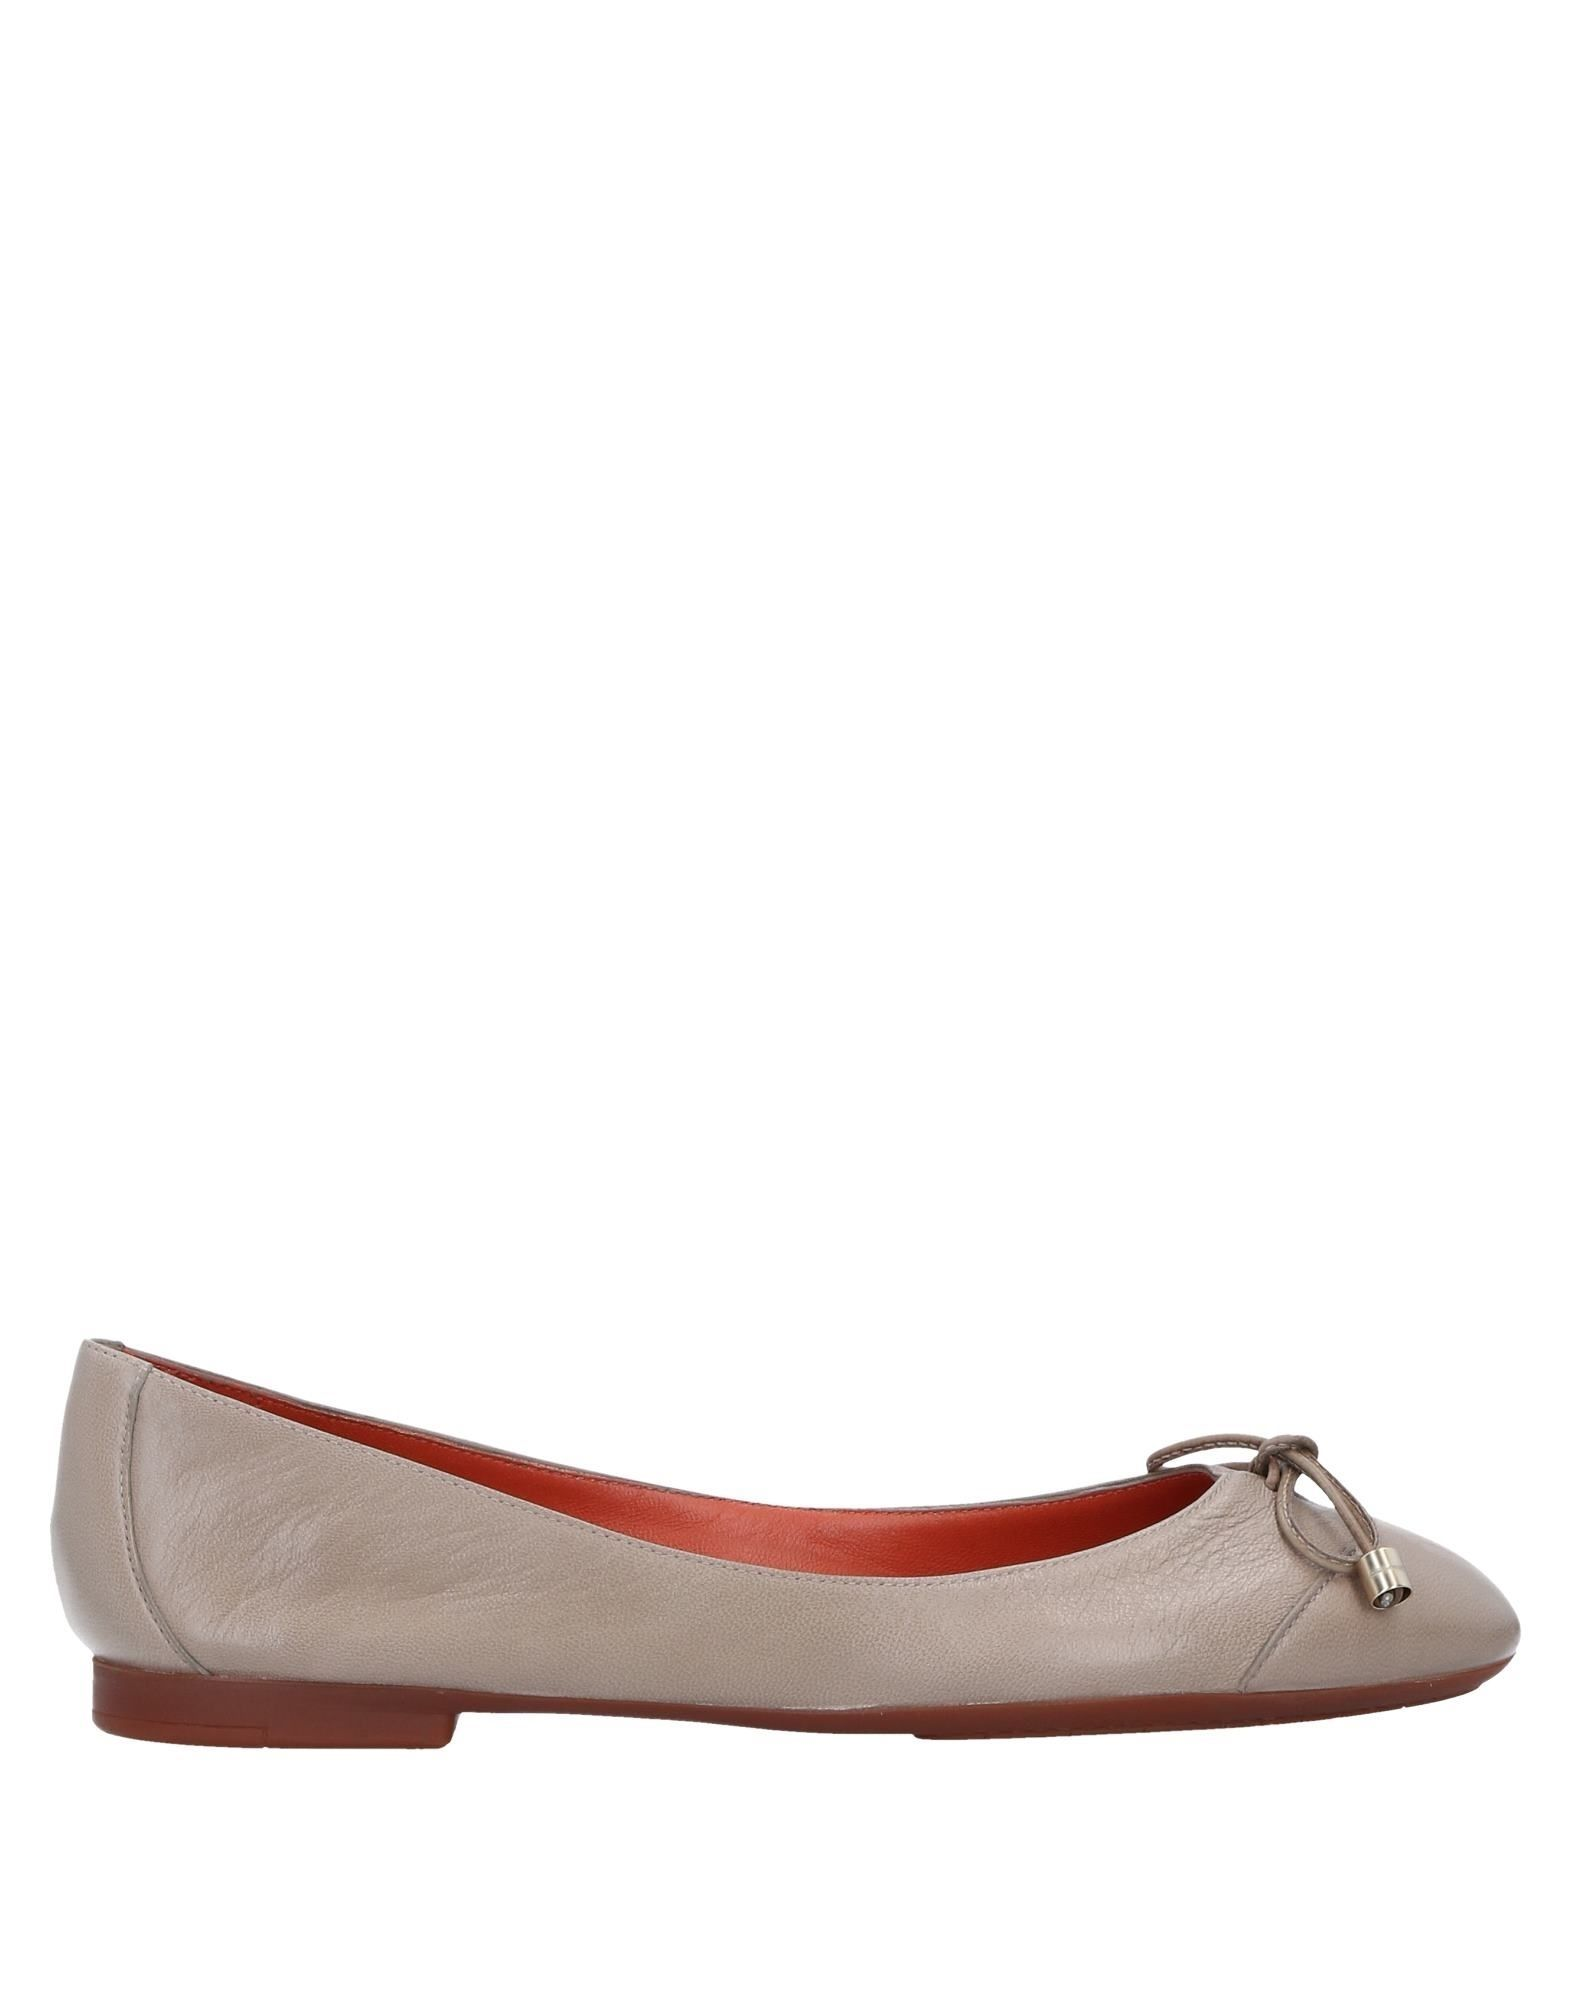 Santoni Dove Grey Leather Ballet Flats